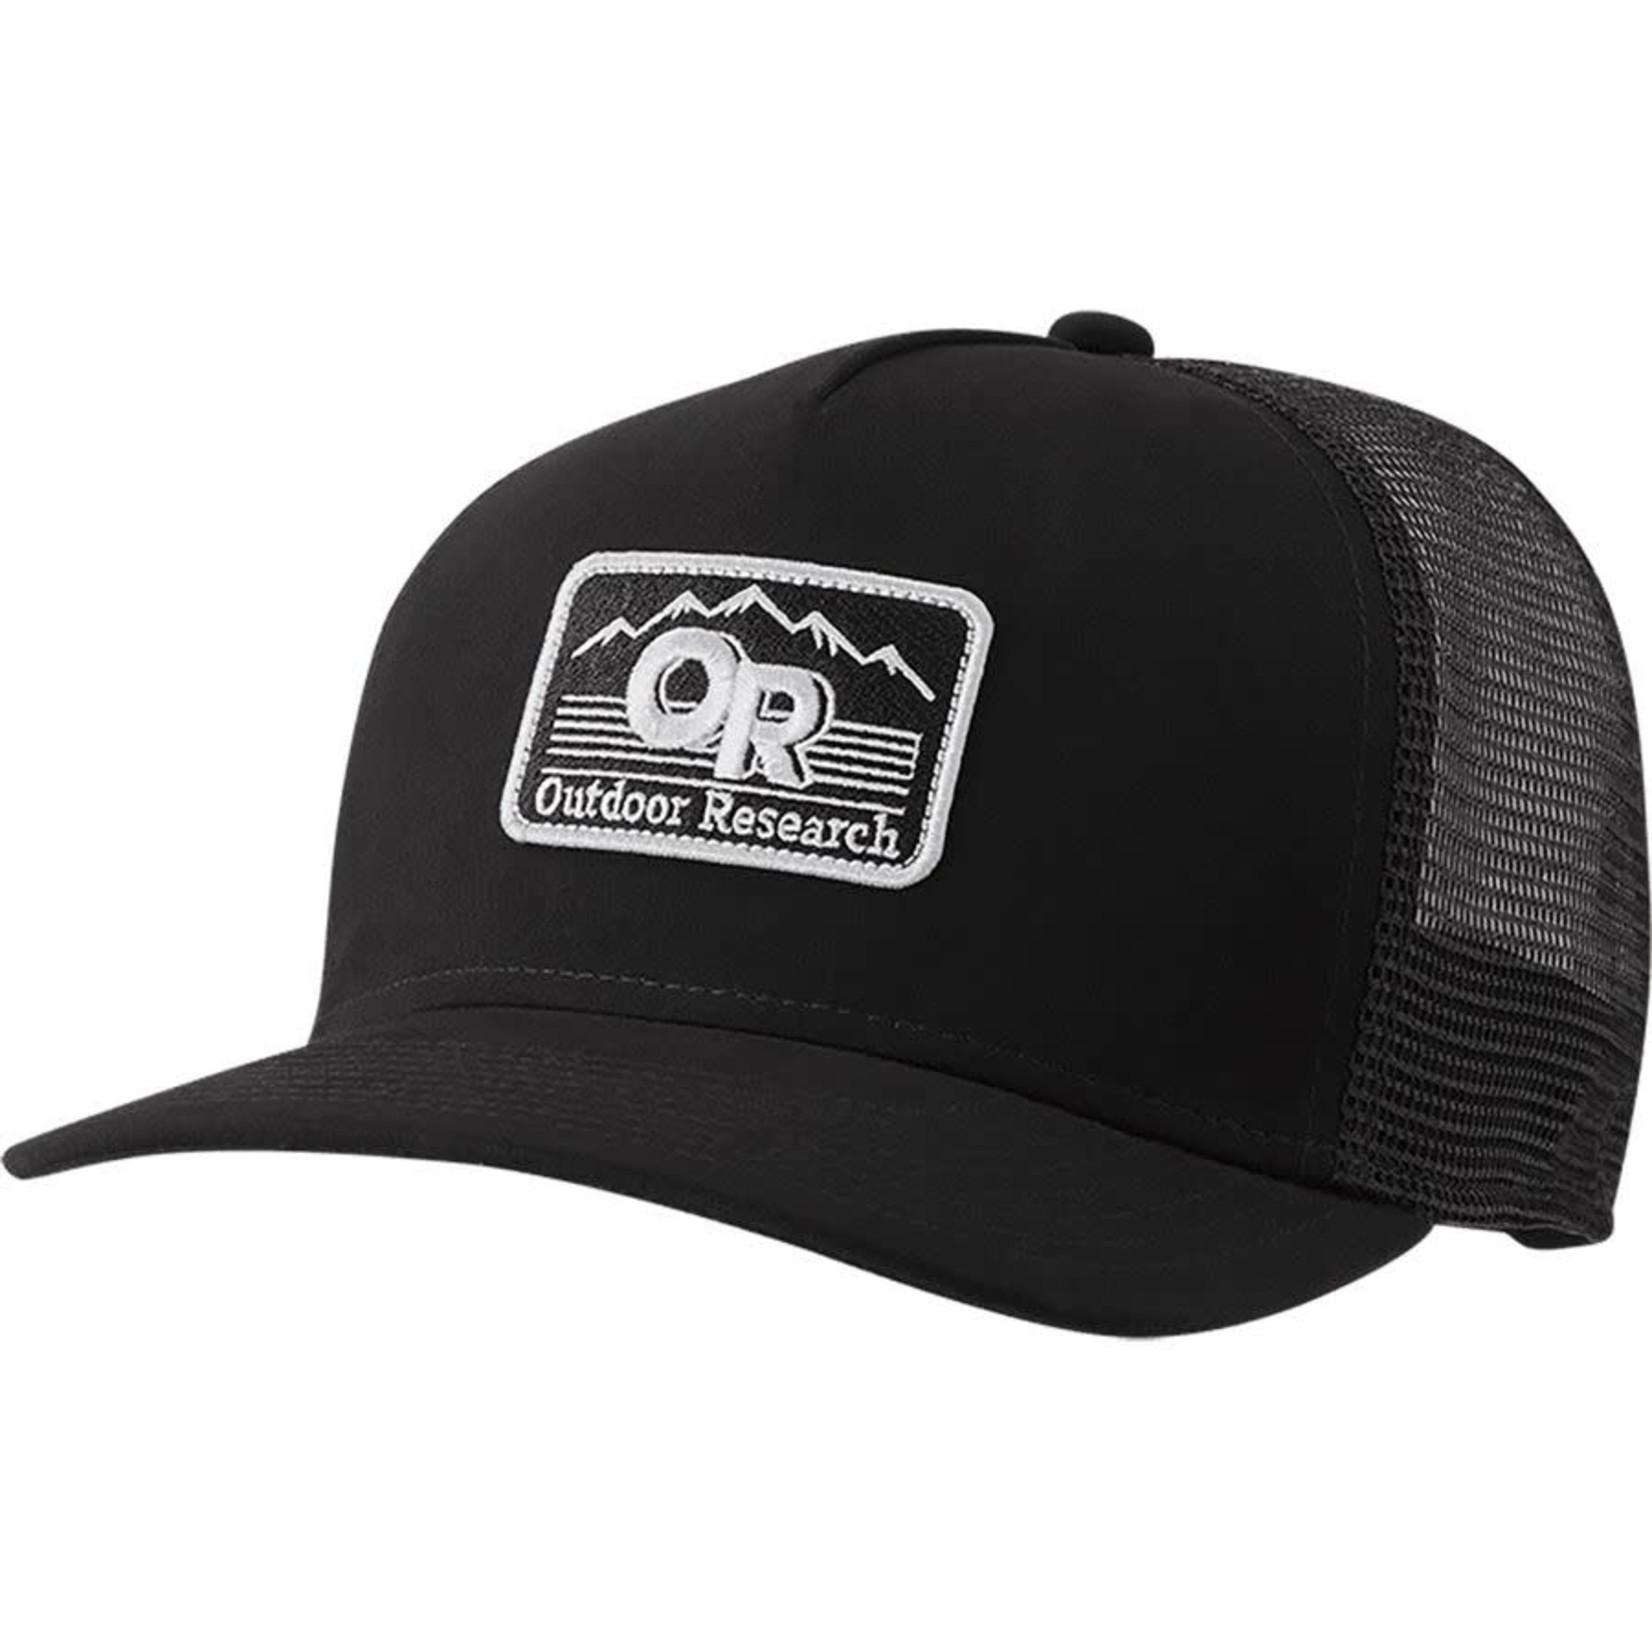 Outdoor Research Outdoor Research Advocate Trucker Cap Black